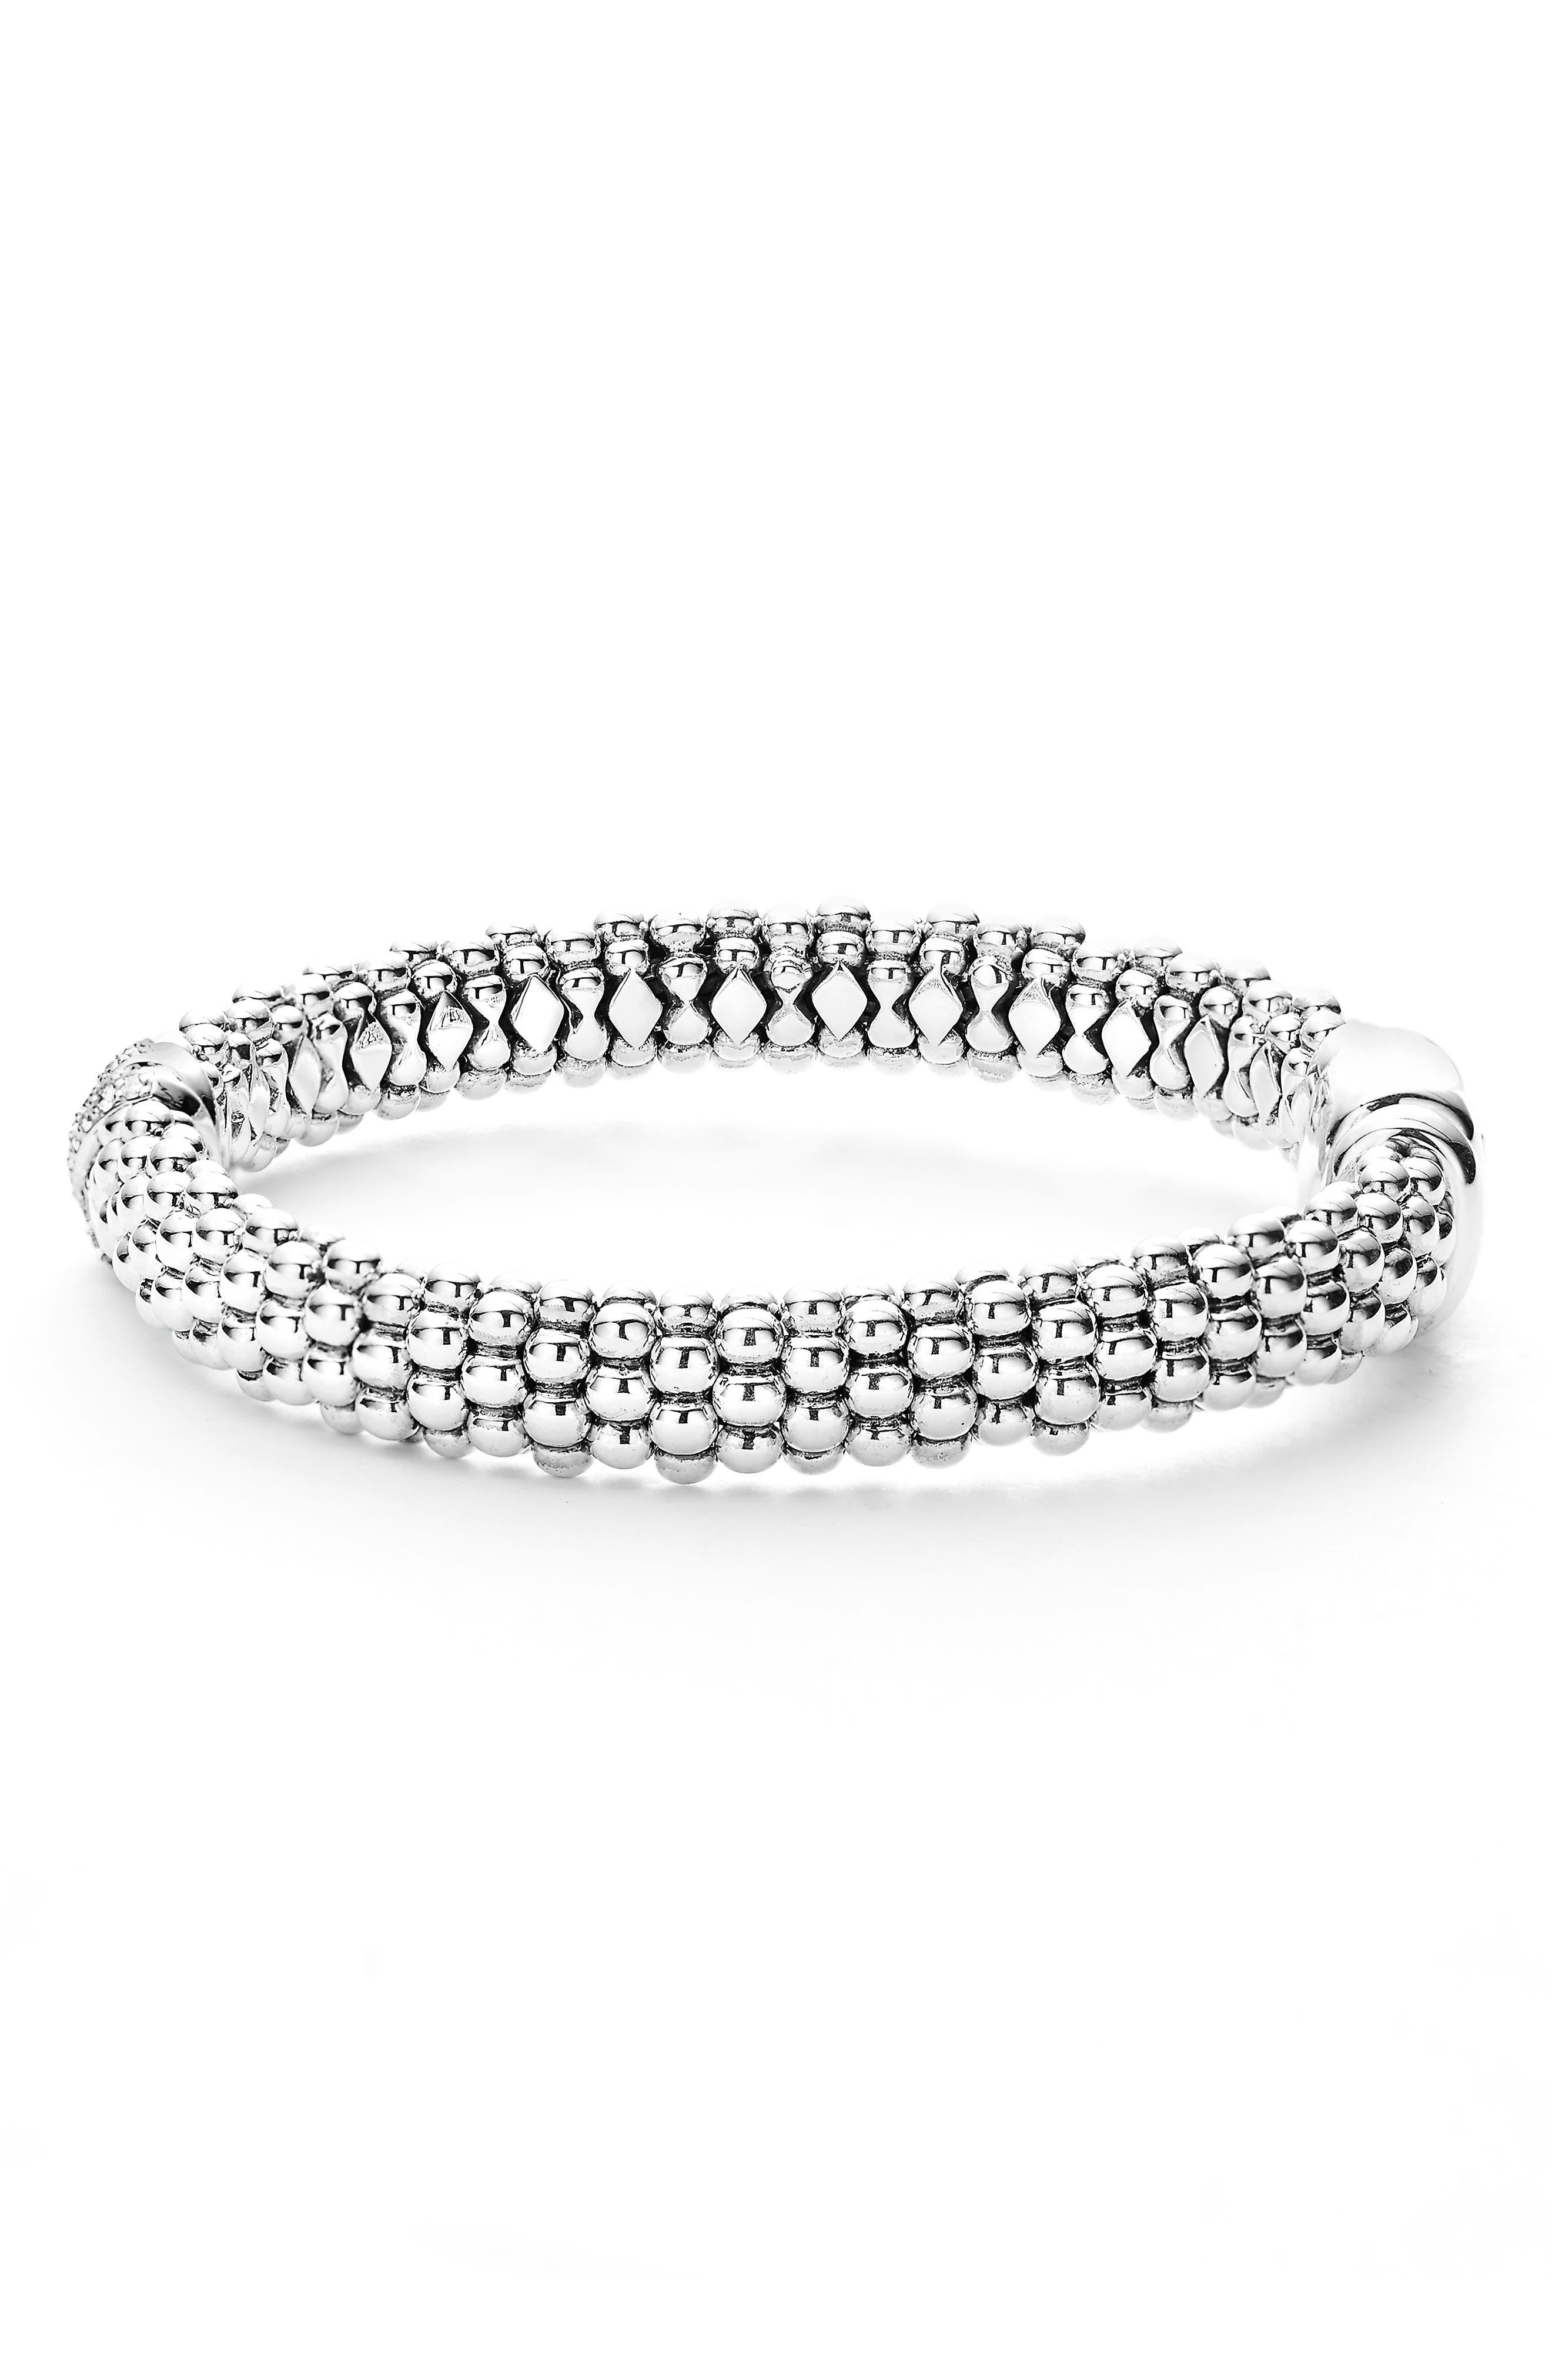 Diamond Lux Single Station X Bracelet,                             Alternate thumbnail 3, color,                             SILVER